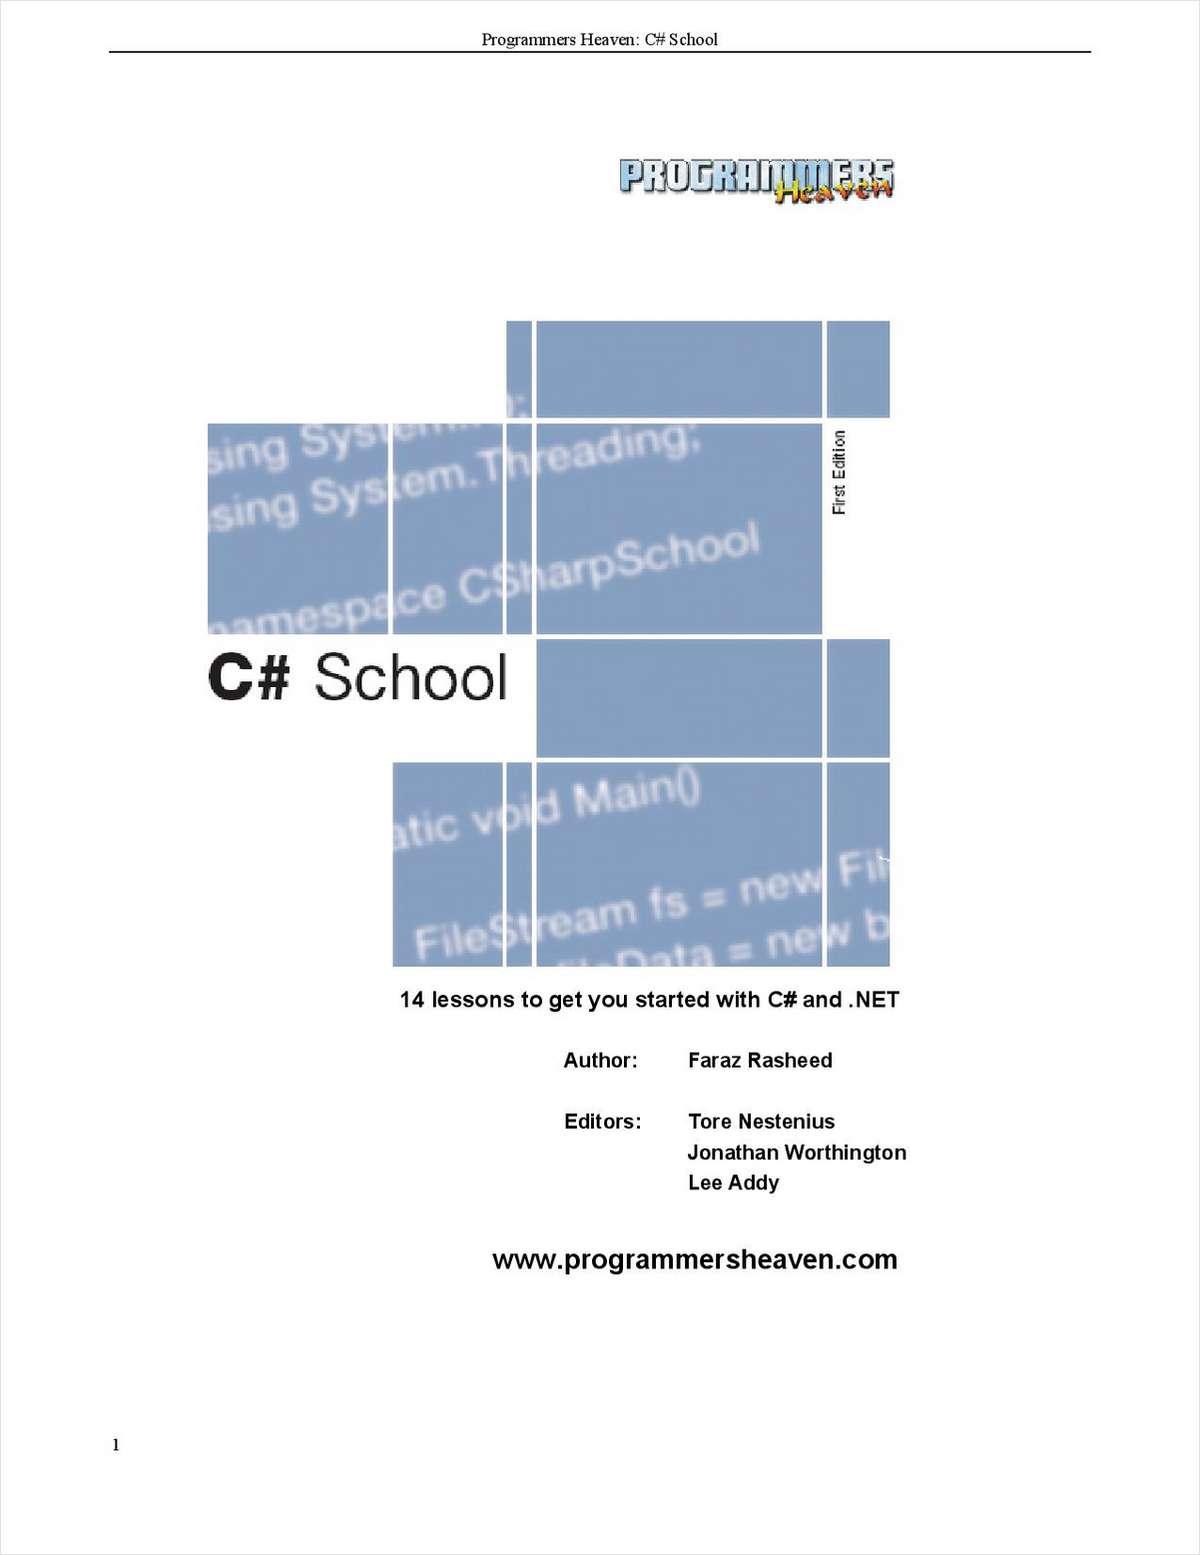 Programmers Heaven C# School Book  -Free 338 Page eBook